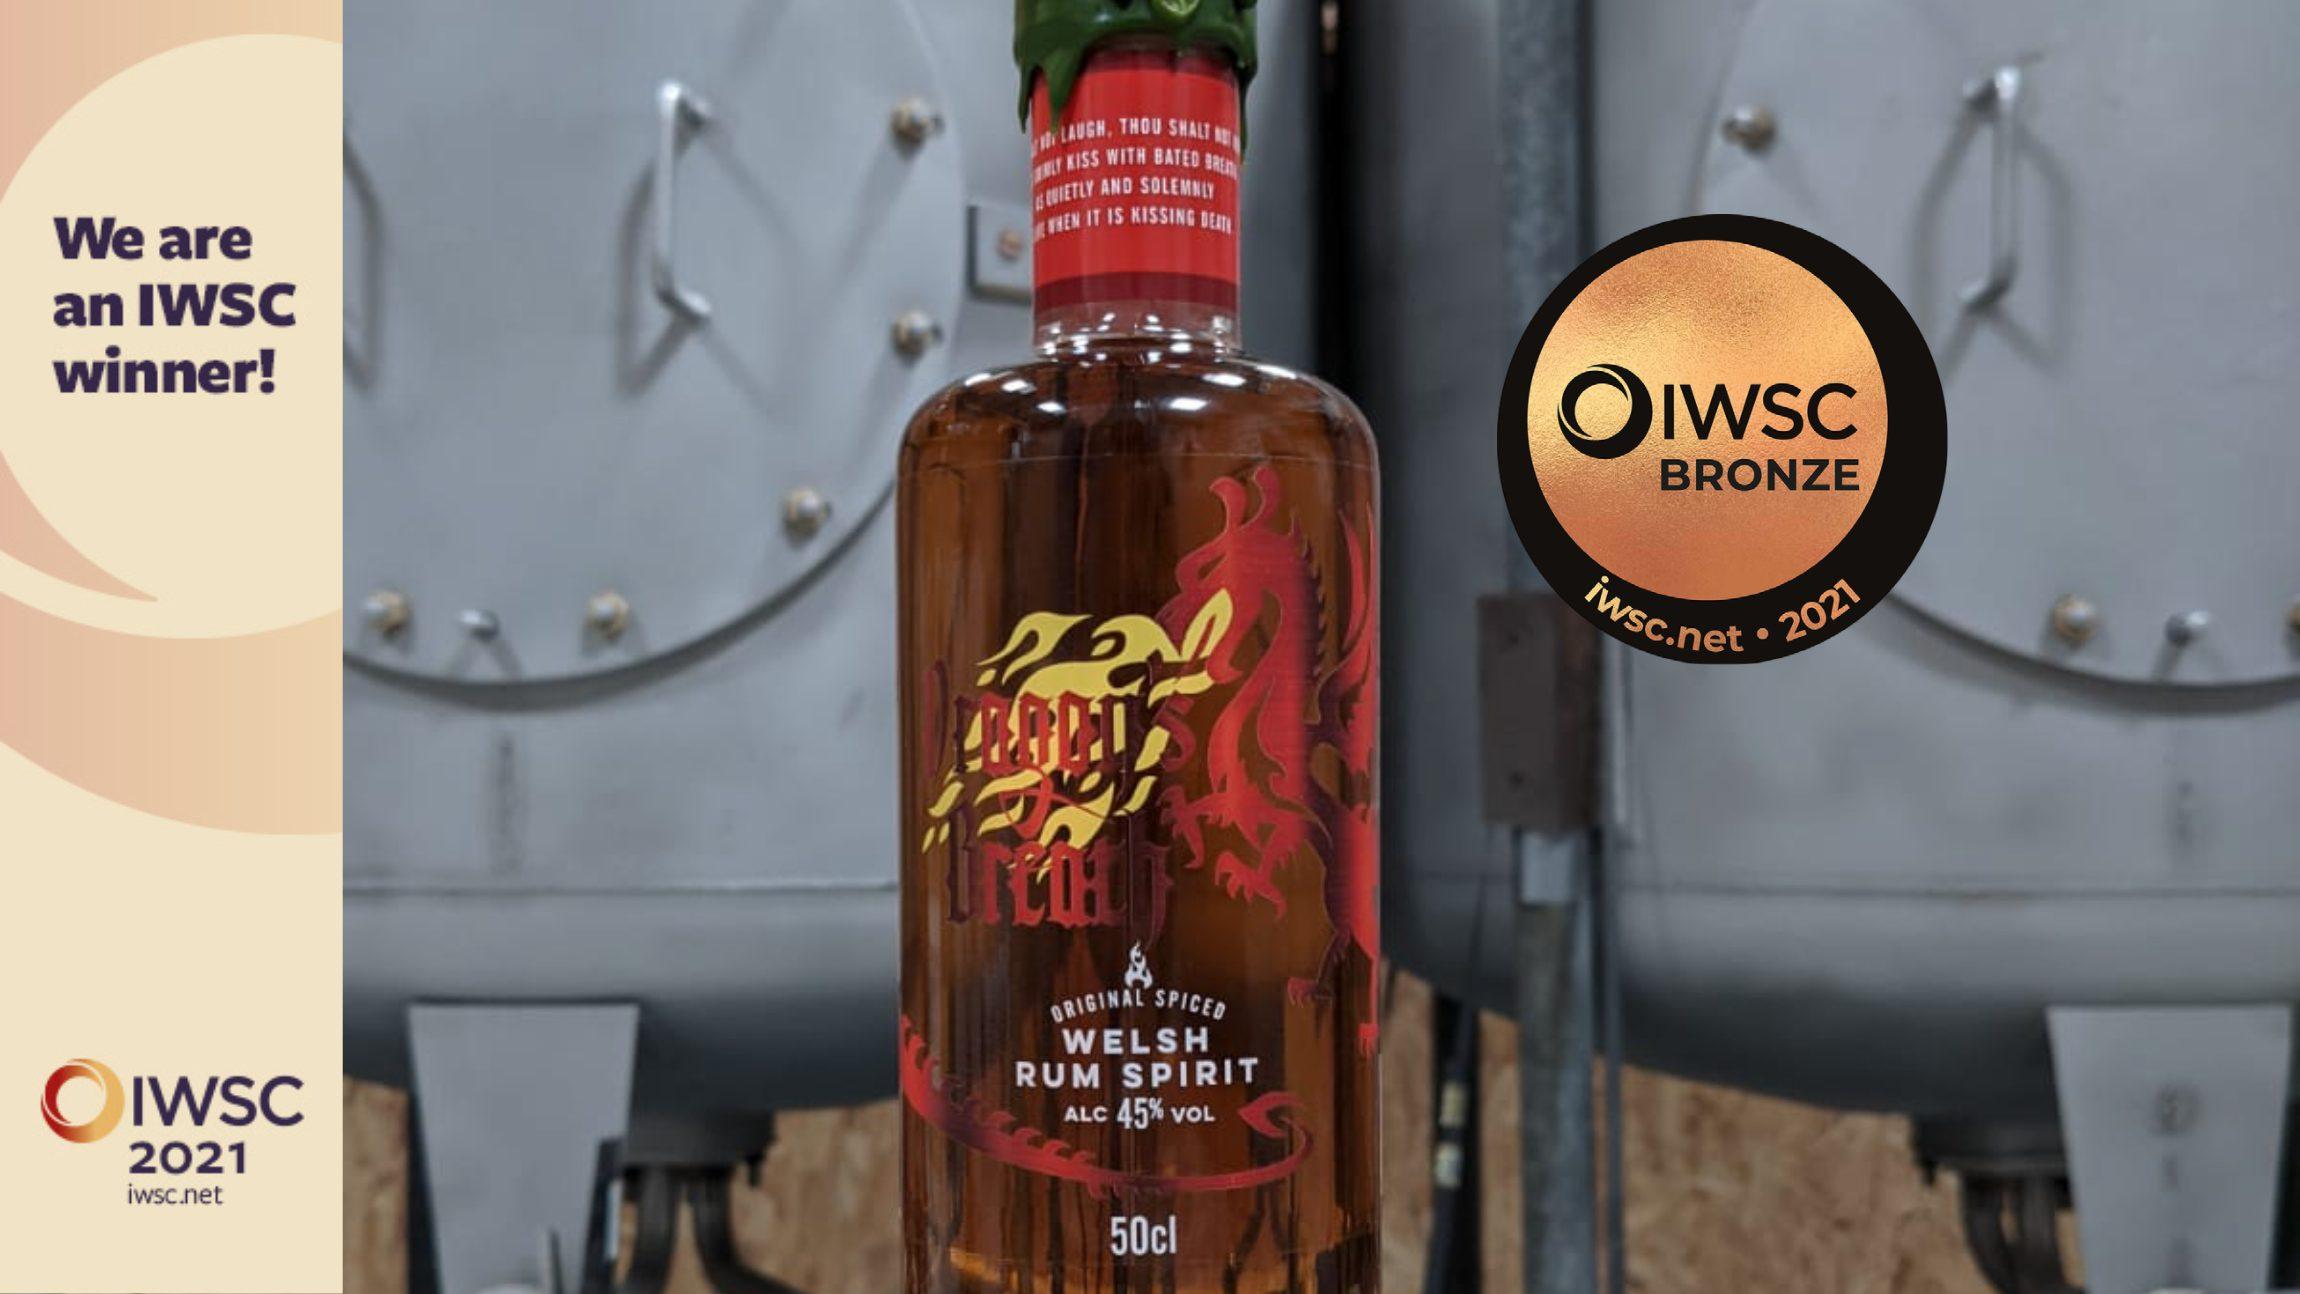 Spirit of Wales Distillery - IWSC - Dragons Breath Spiced Welsh Rum